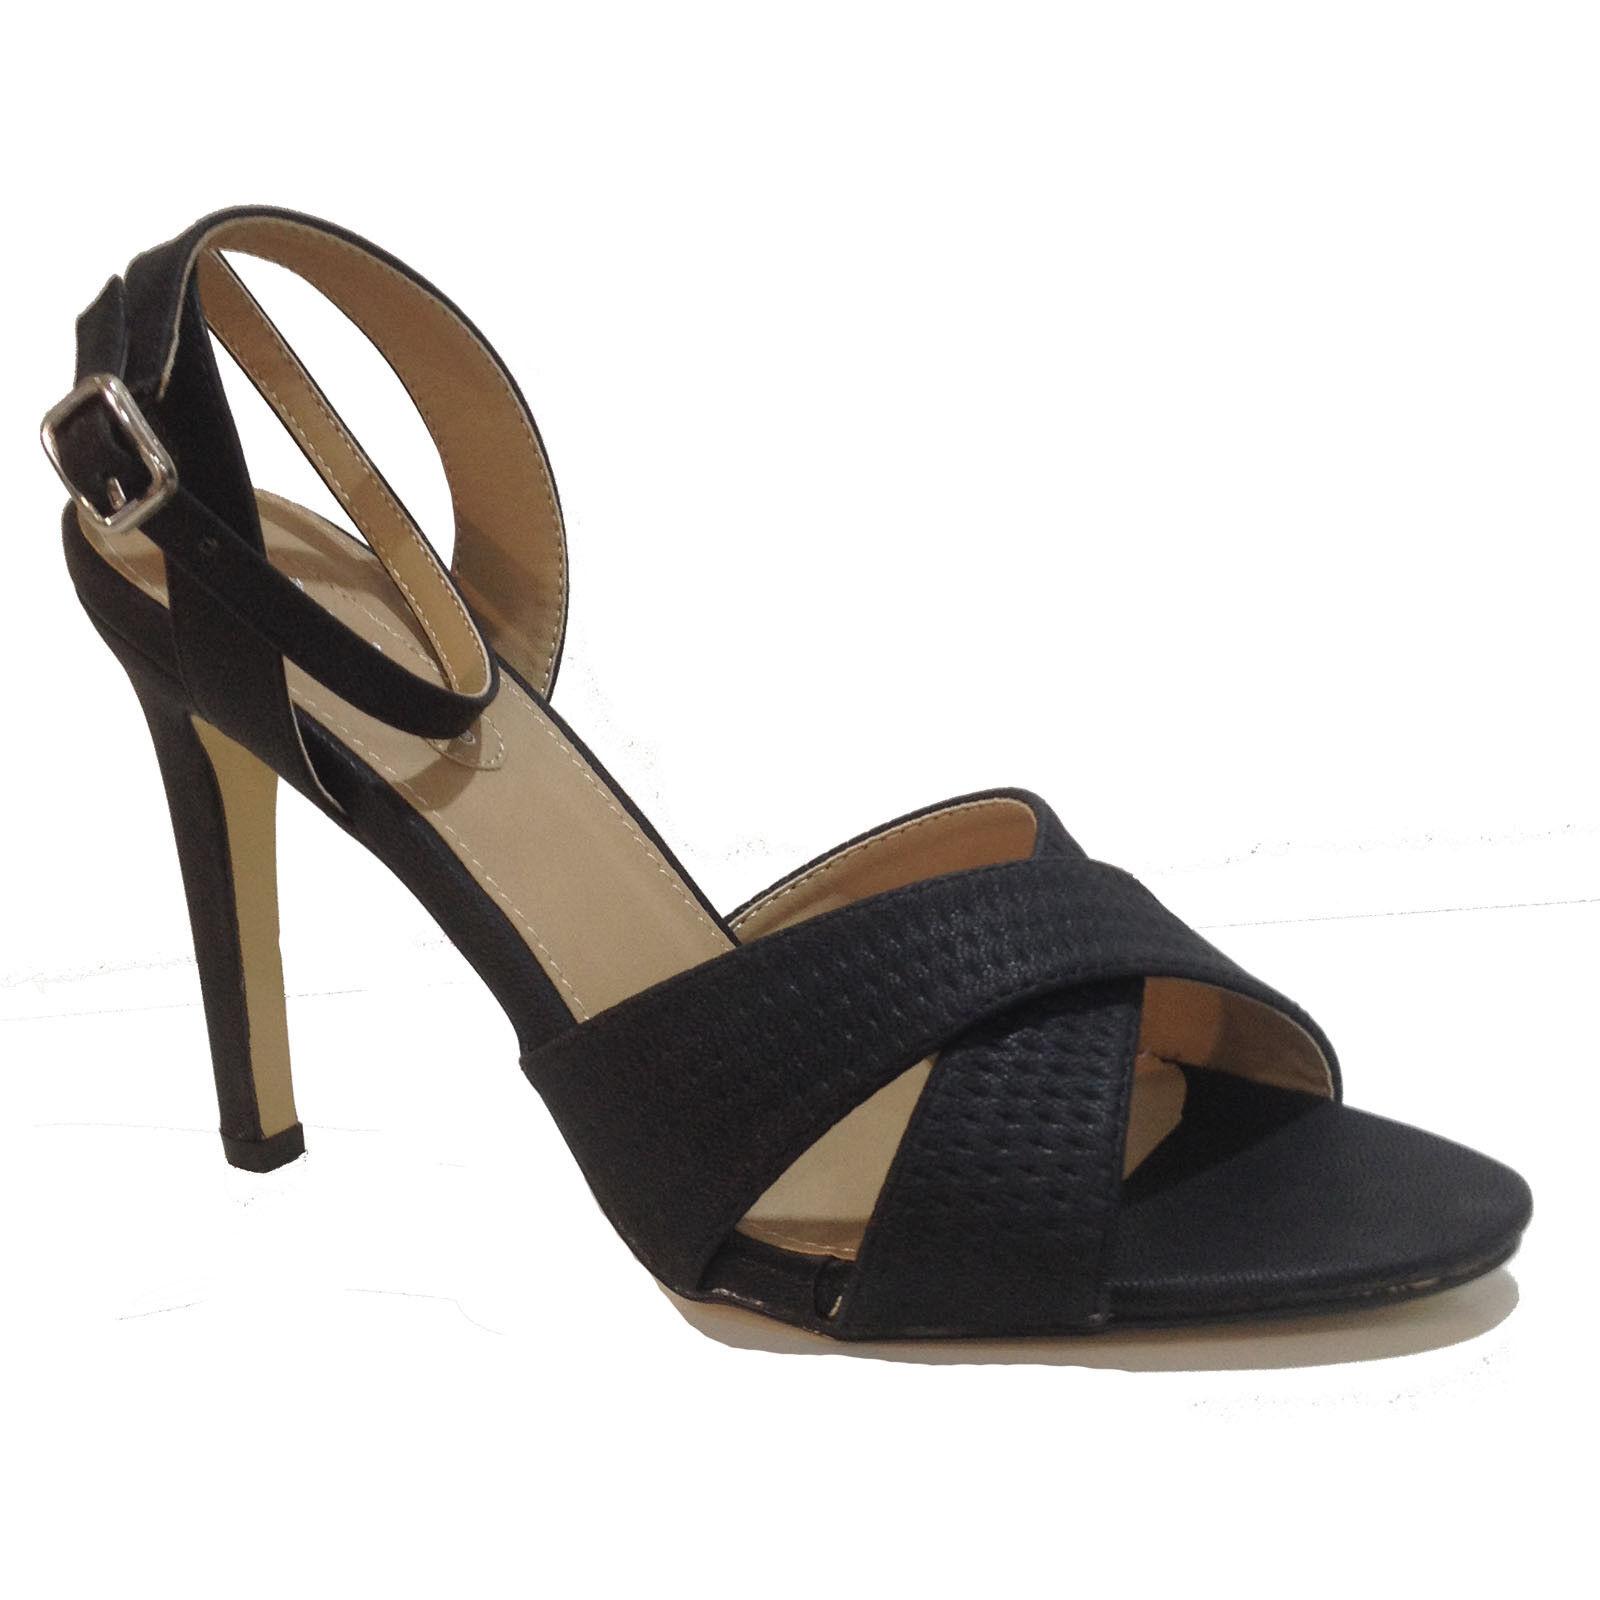 ☼ELEN☼ Sandales à talons - TRENDY TRENDY TRENDY TOO - Ref  0804 f6e1e1